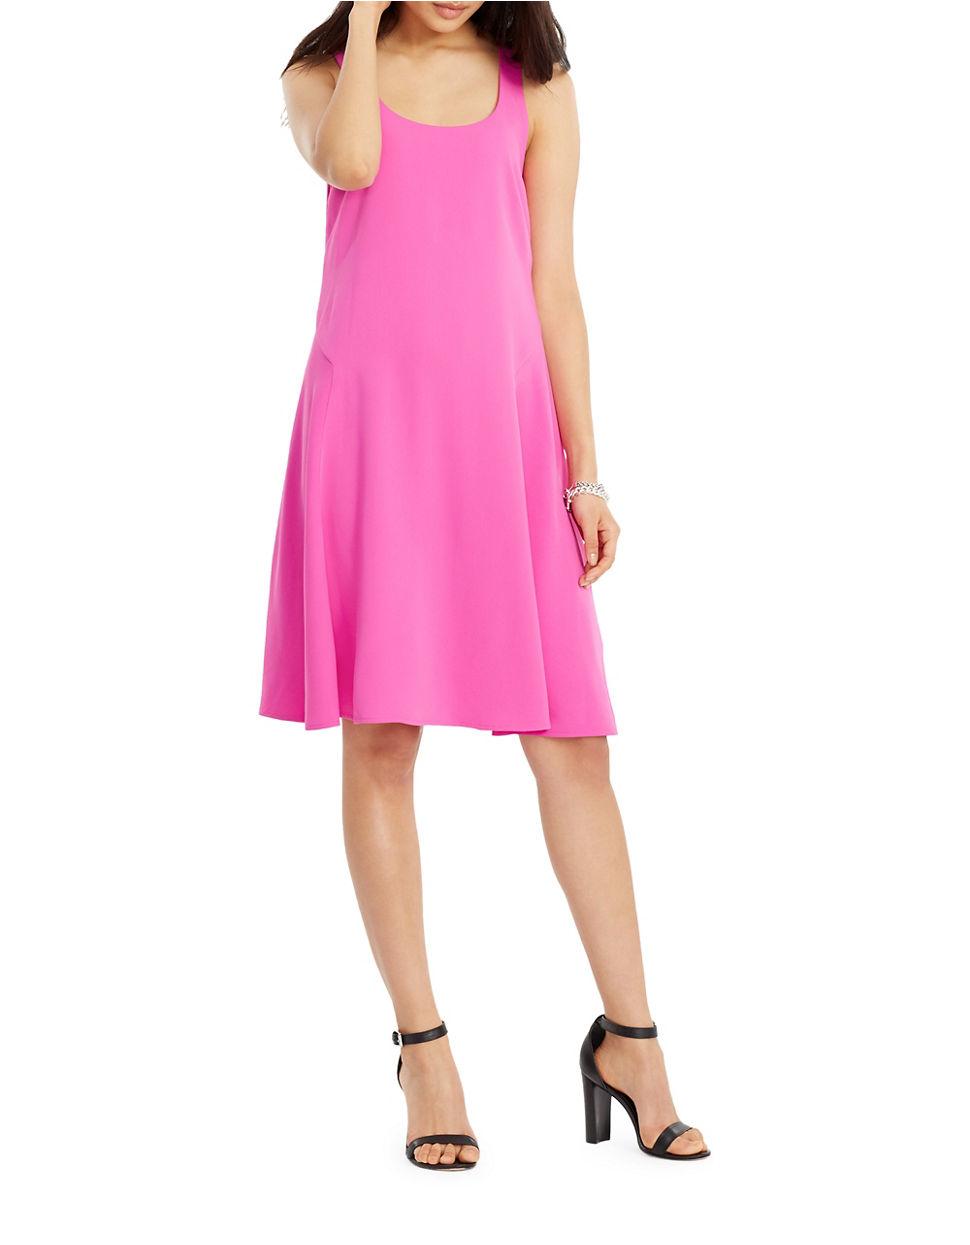 Платье Ralph Lauren 42 размер.